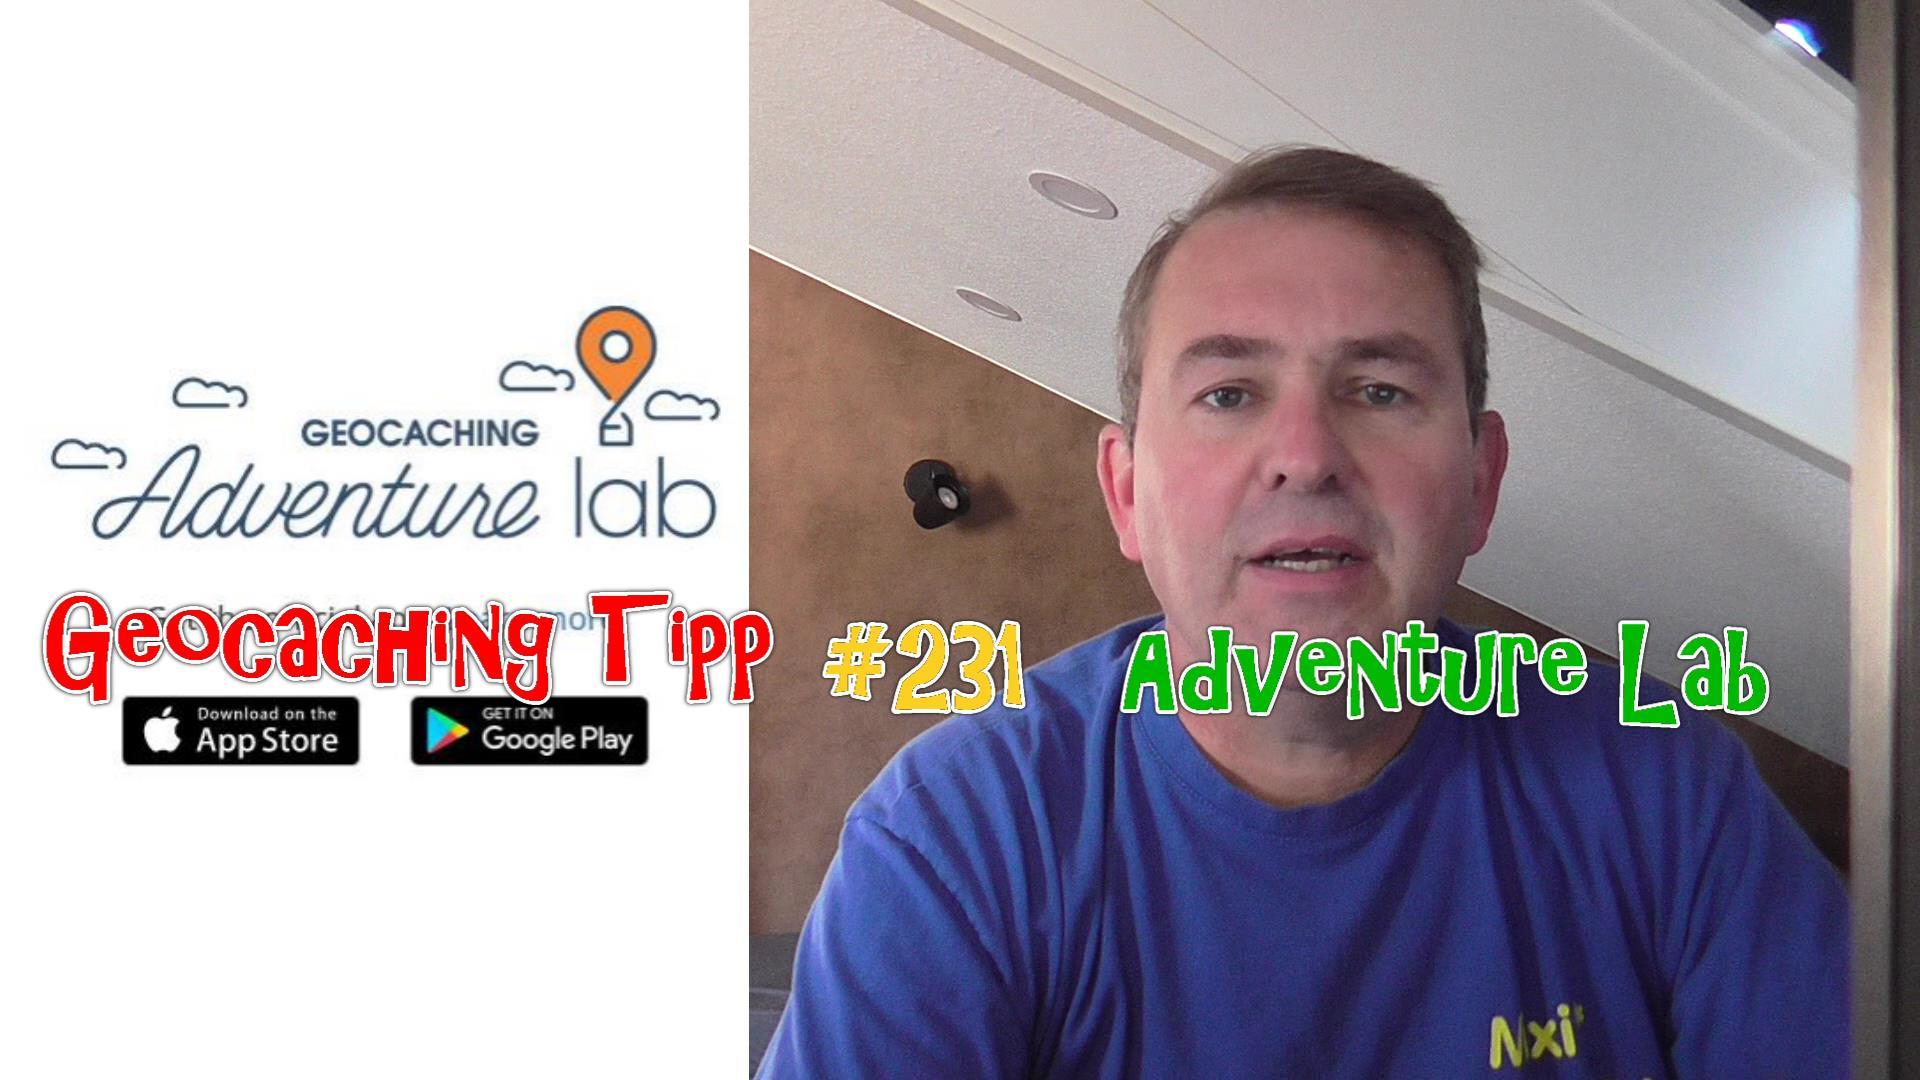 Geocaching Tipp 231 - Adventure Lab